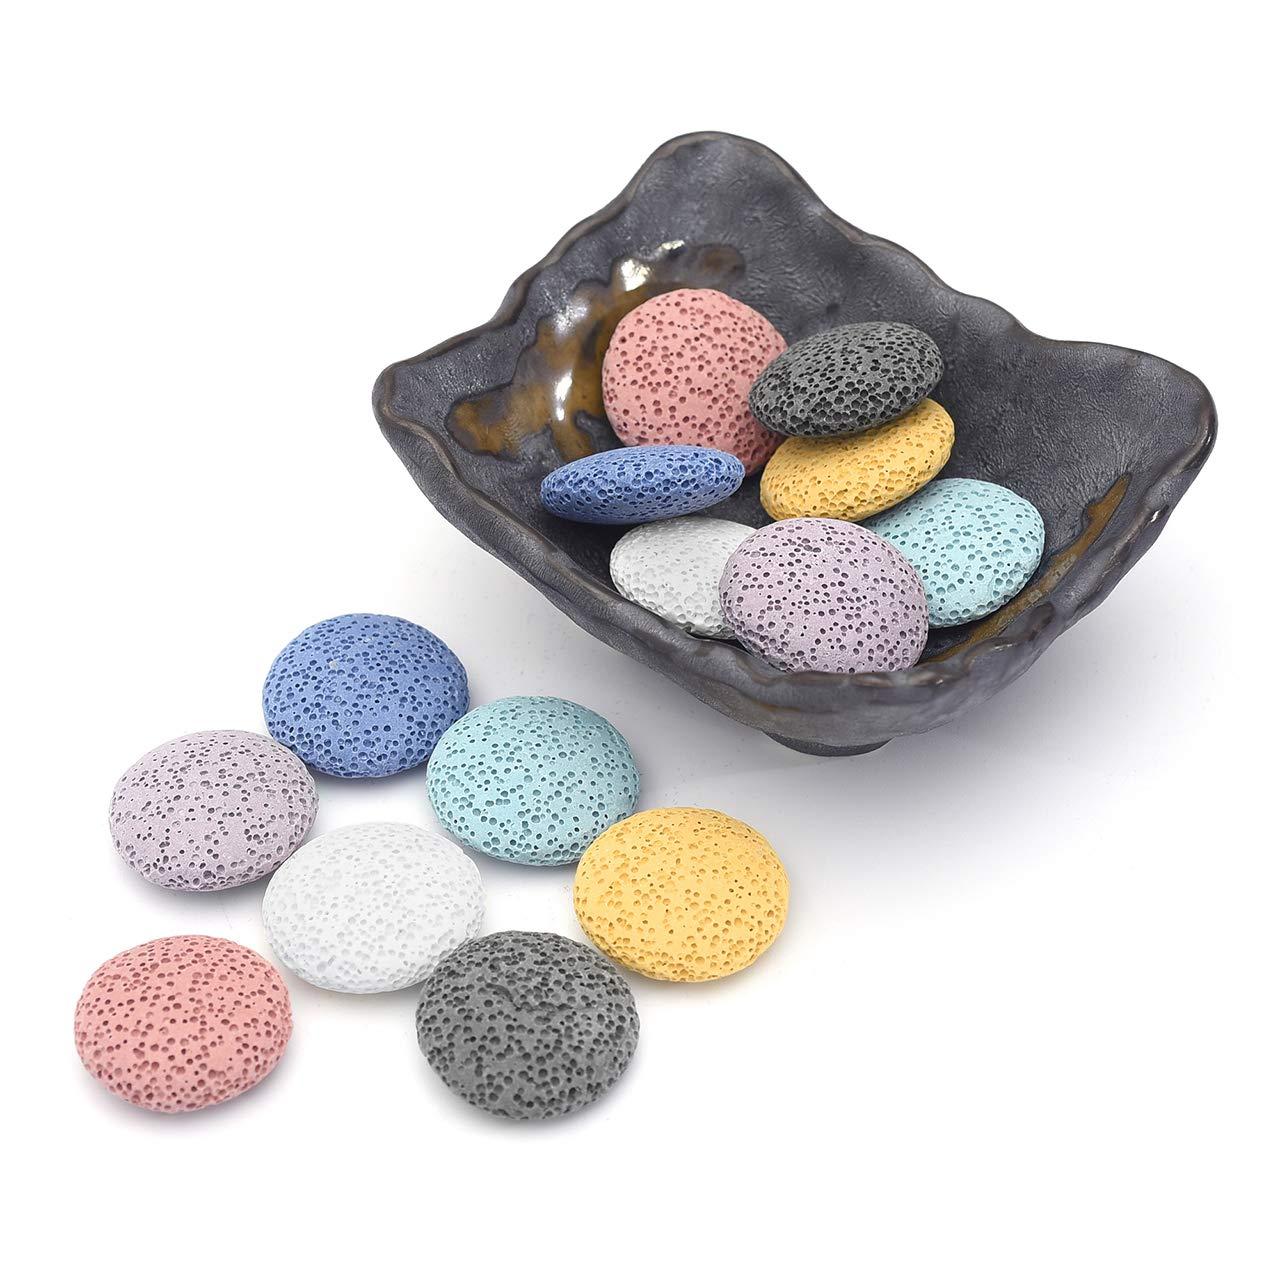 Top Plaza Lava Rock Stone Aromatherapy Essential Oil Diffuser Set Square Ceramic Fragrance Perfume Ware Bowl with 14Pcs Round Shape Lava Stone Beads